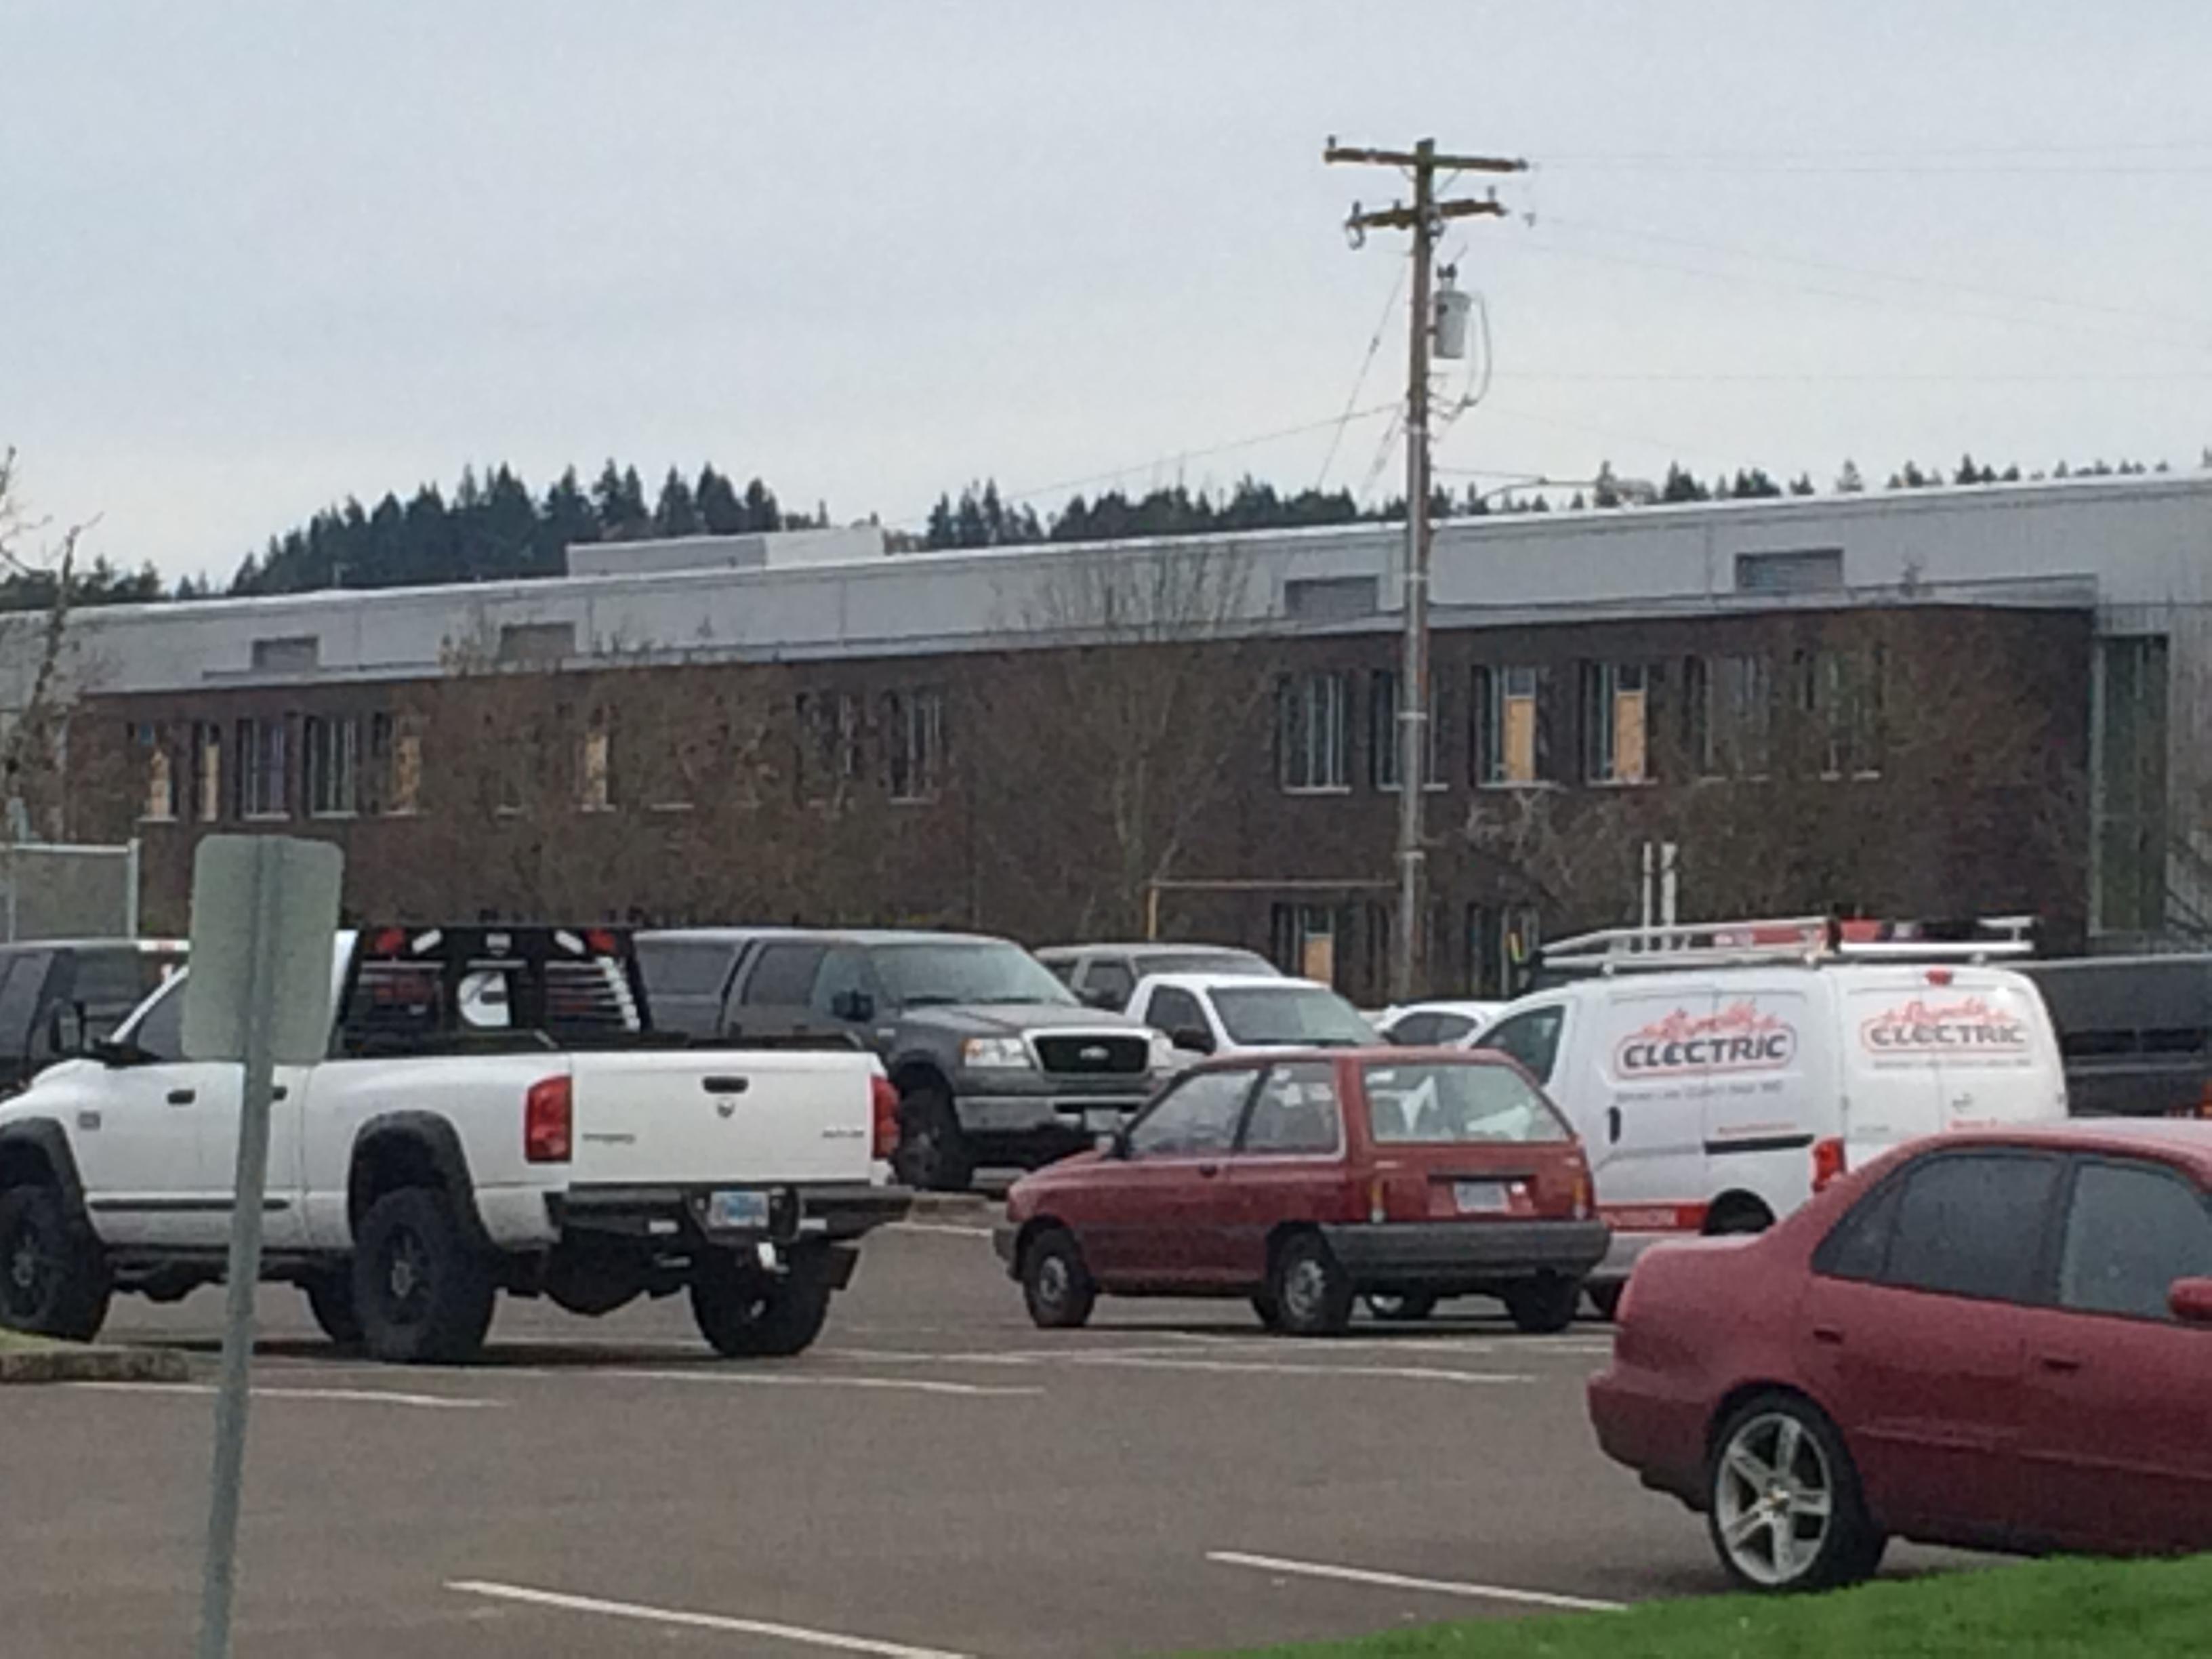 Gina Dhom, Real Estate, Eugene, OR, South Eugene, Schools, home buying